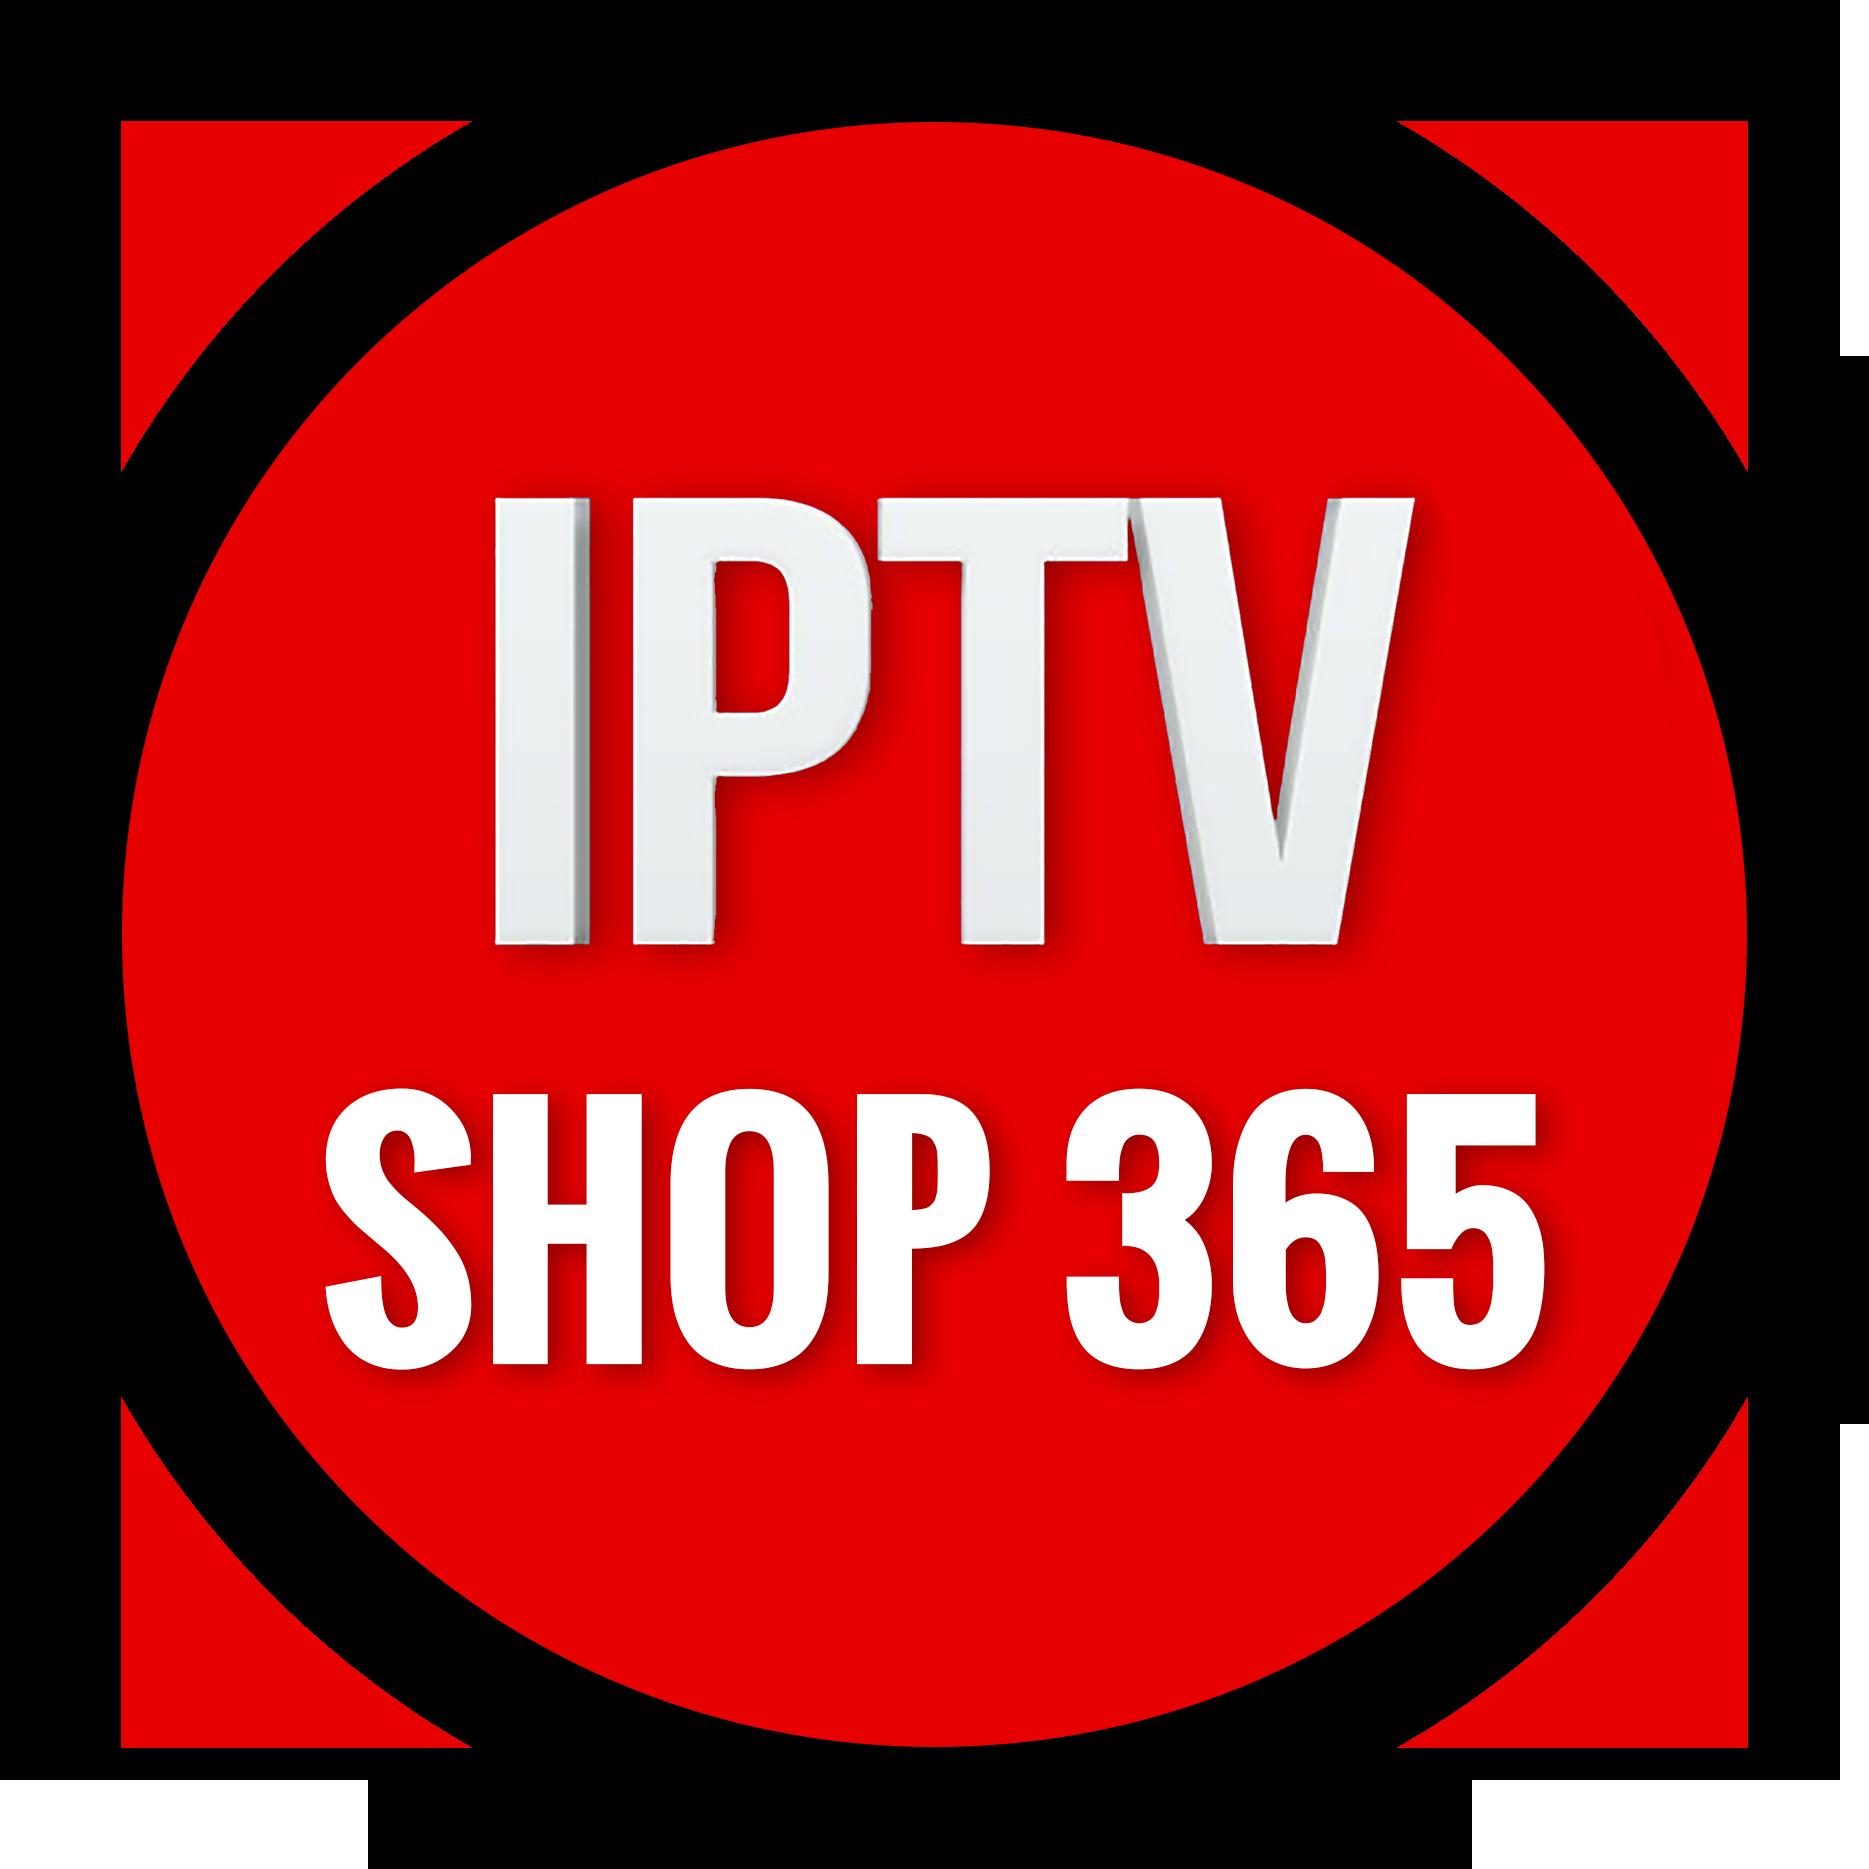 Iptvshop365